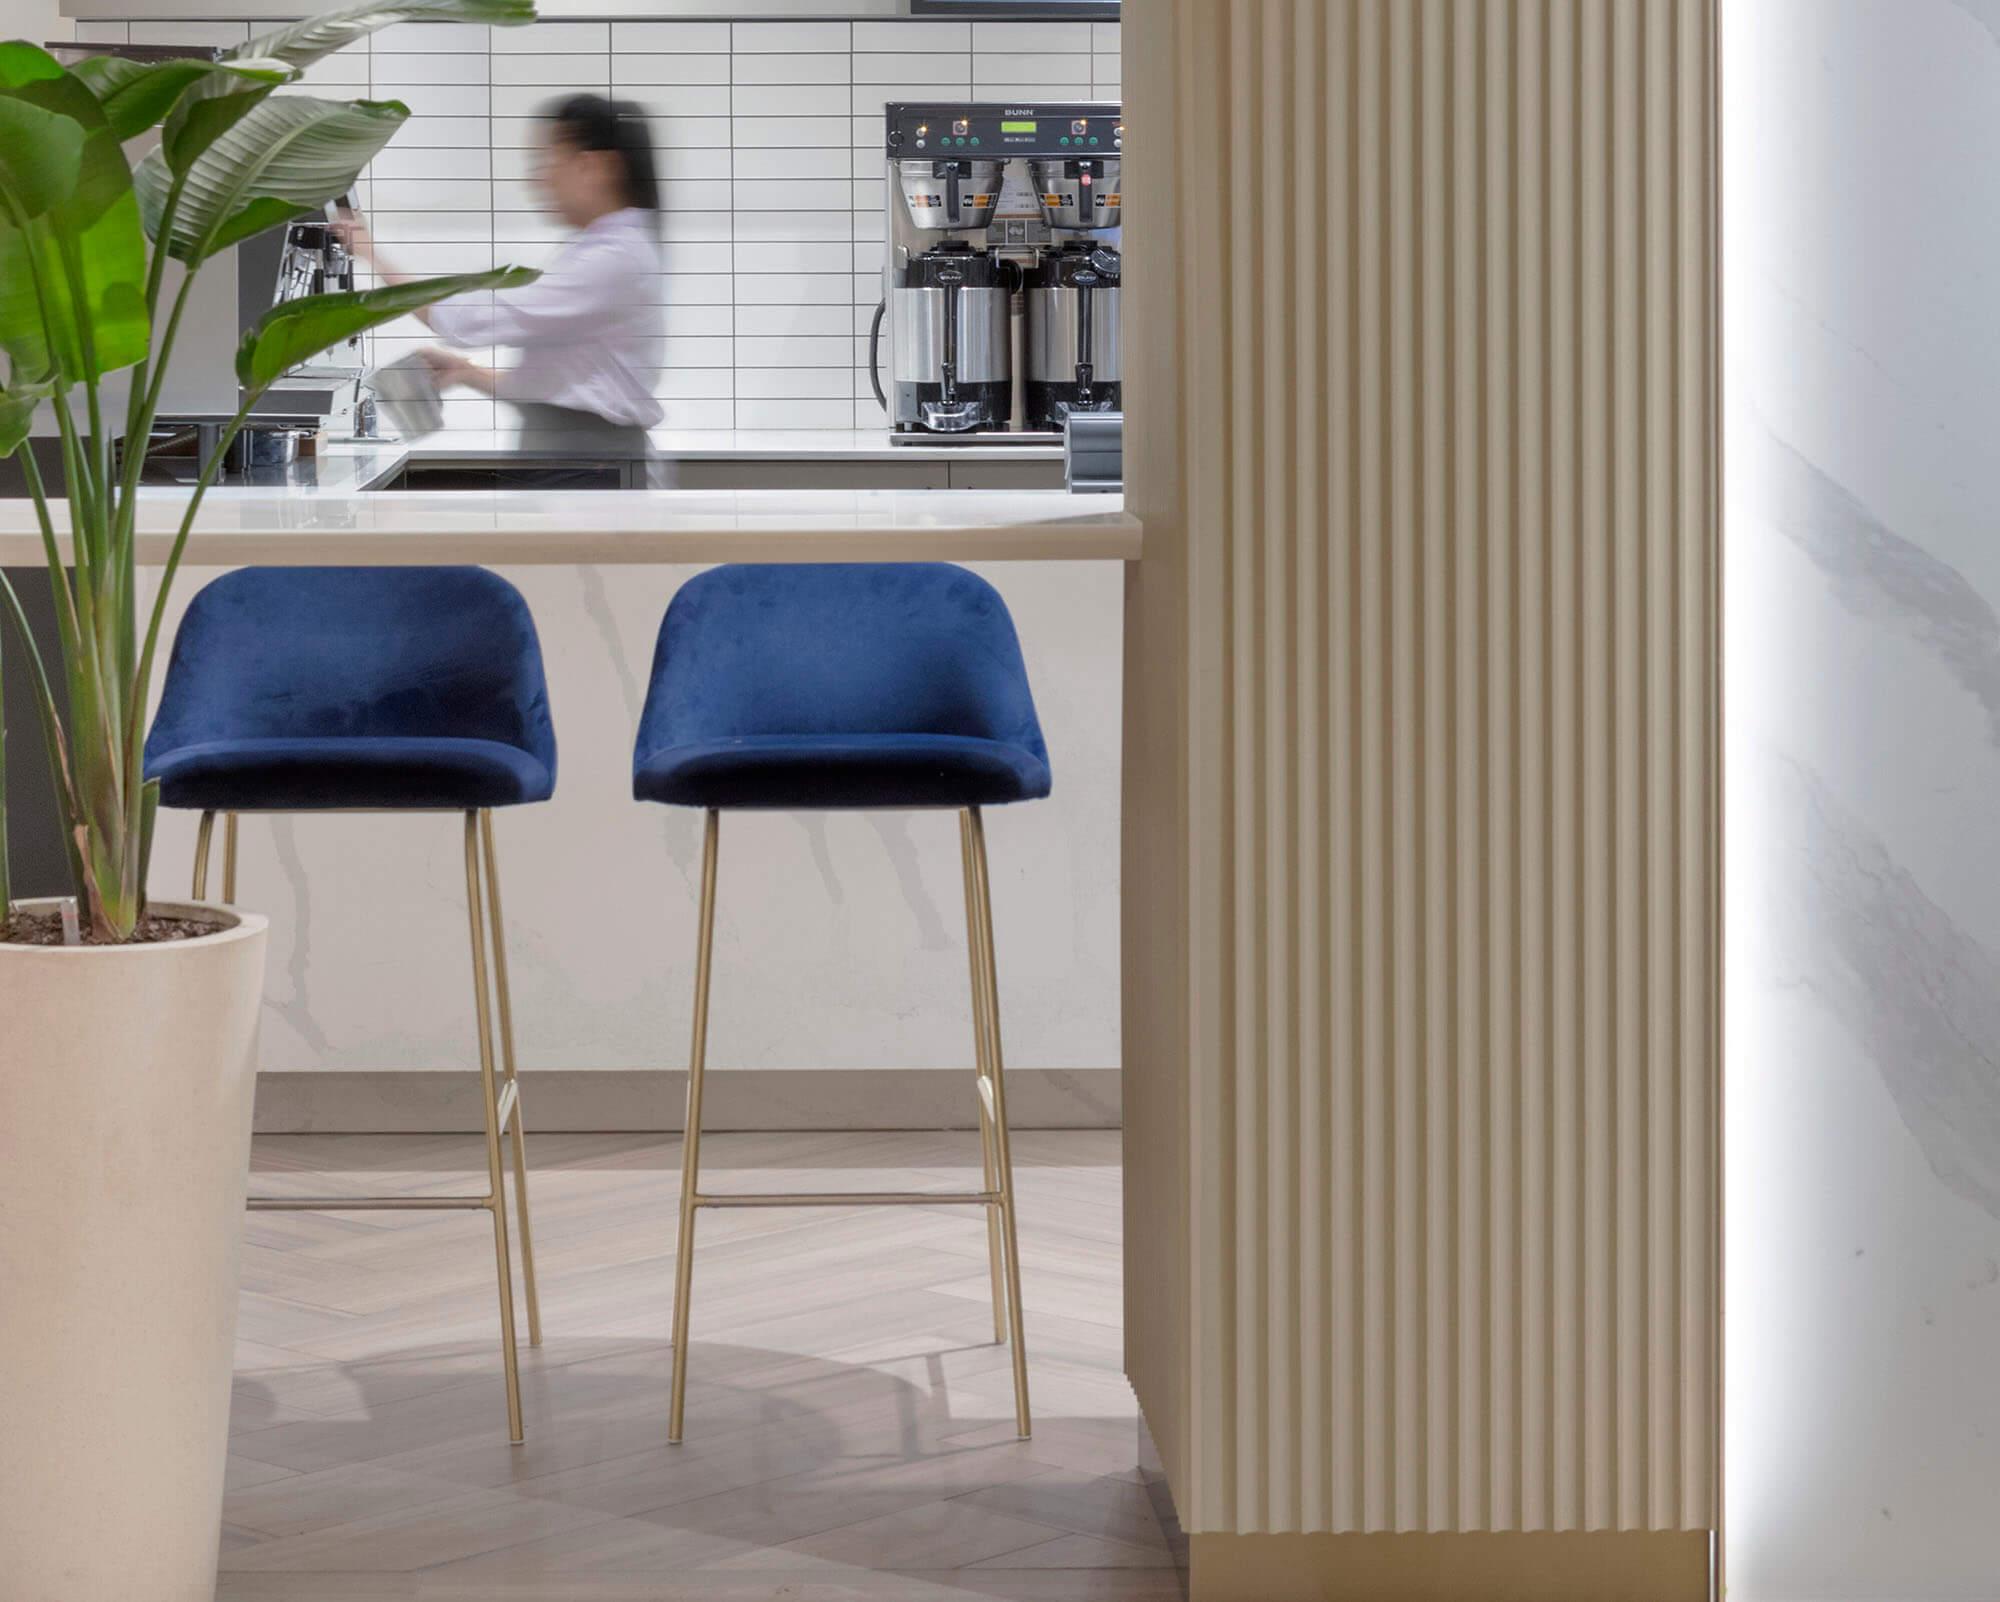 T&Co, cafe, interior design, interior designer, vancouver, canada, america